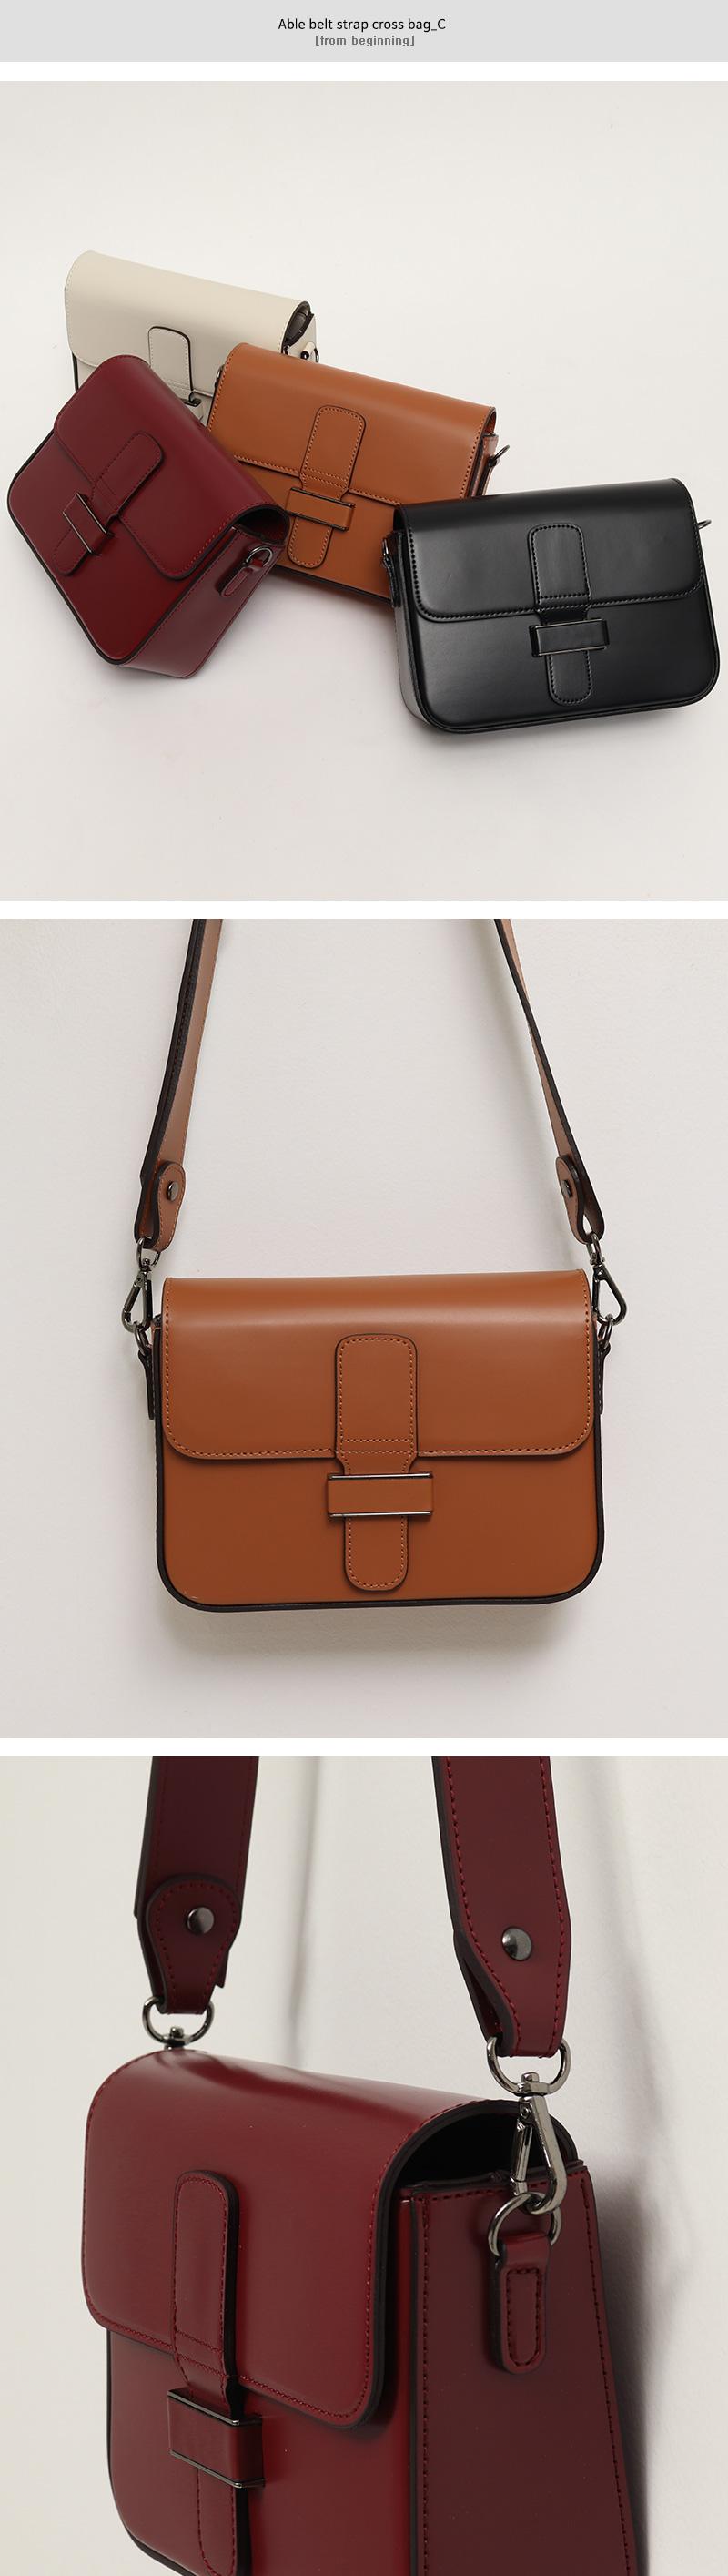 Able belt strap cross bag_C